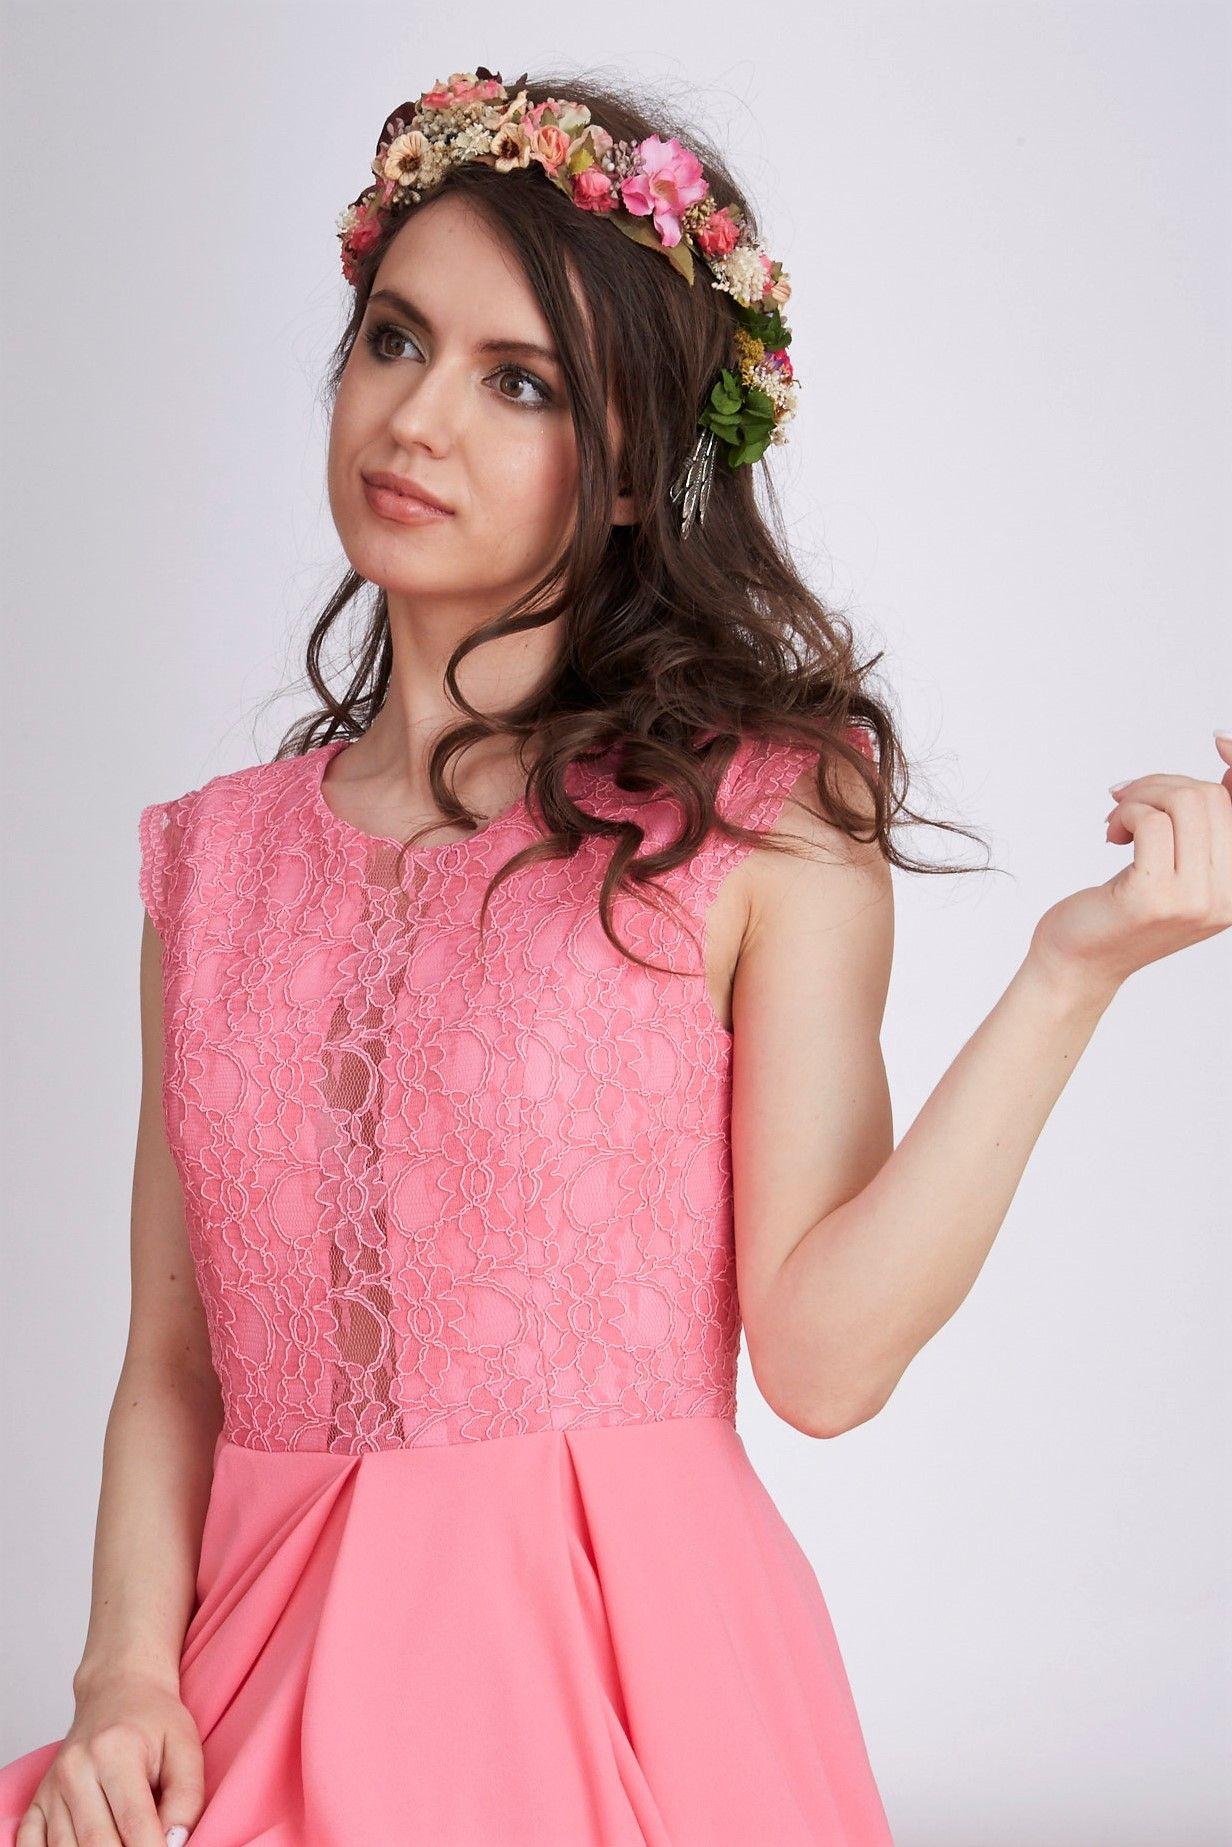 The Christy Mini Dress - Lace Millennial pink dress | Pinterest ...